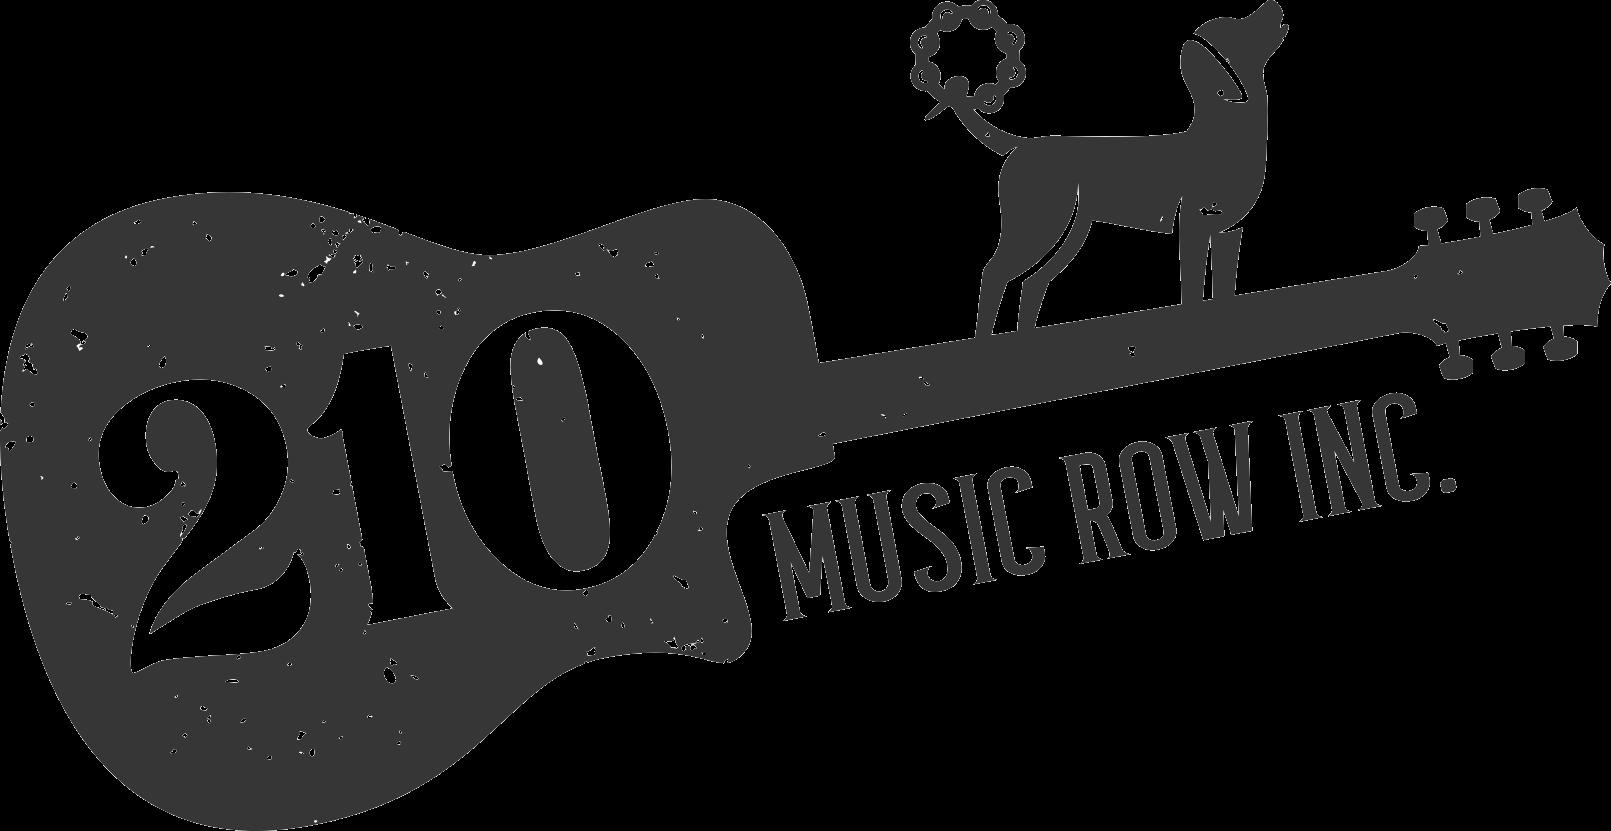 210 Music Row